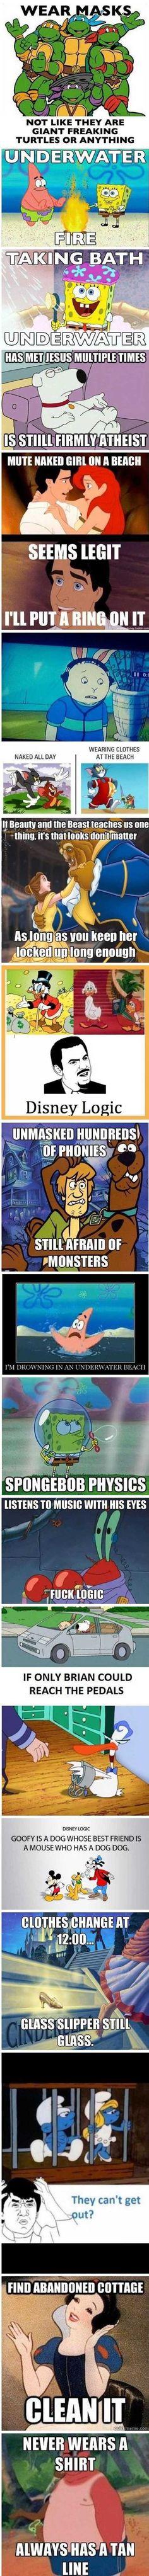 Cartoon logic. I wonder about the Spongebob stuff all the time.